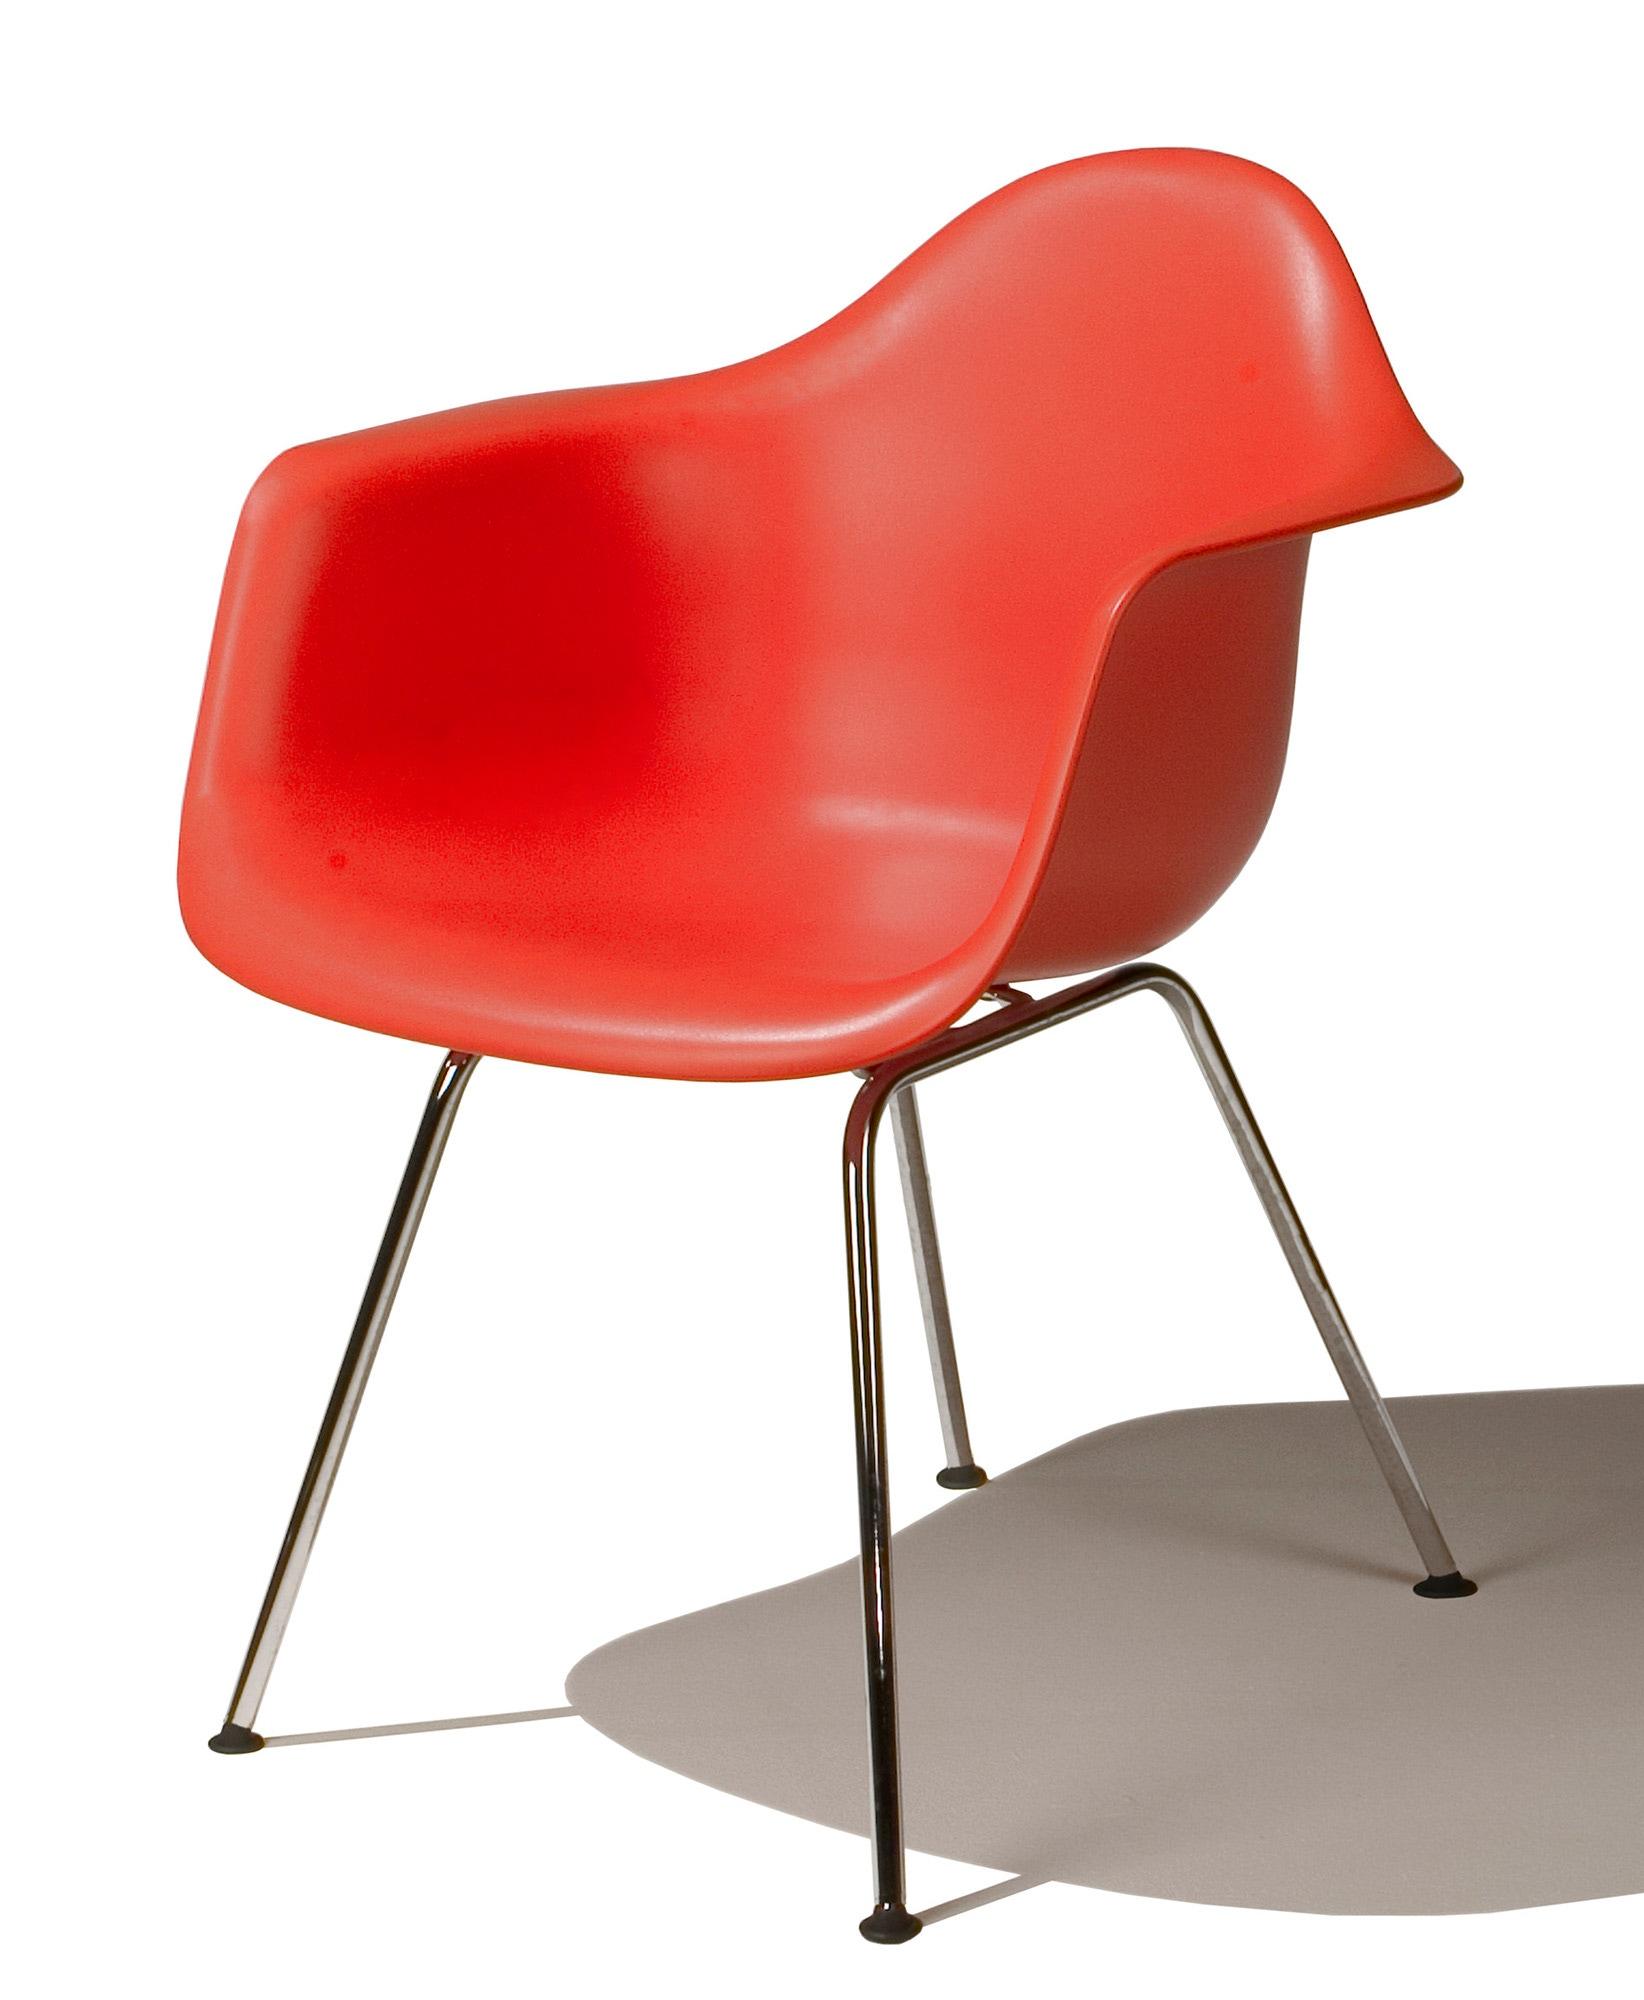 Herman Miller Eames® Molded Plastic Armchair - GR Shop Canada